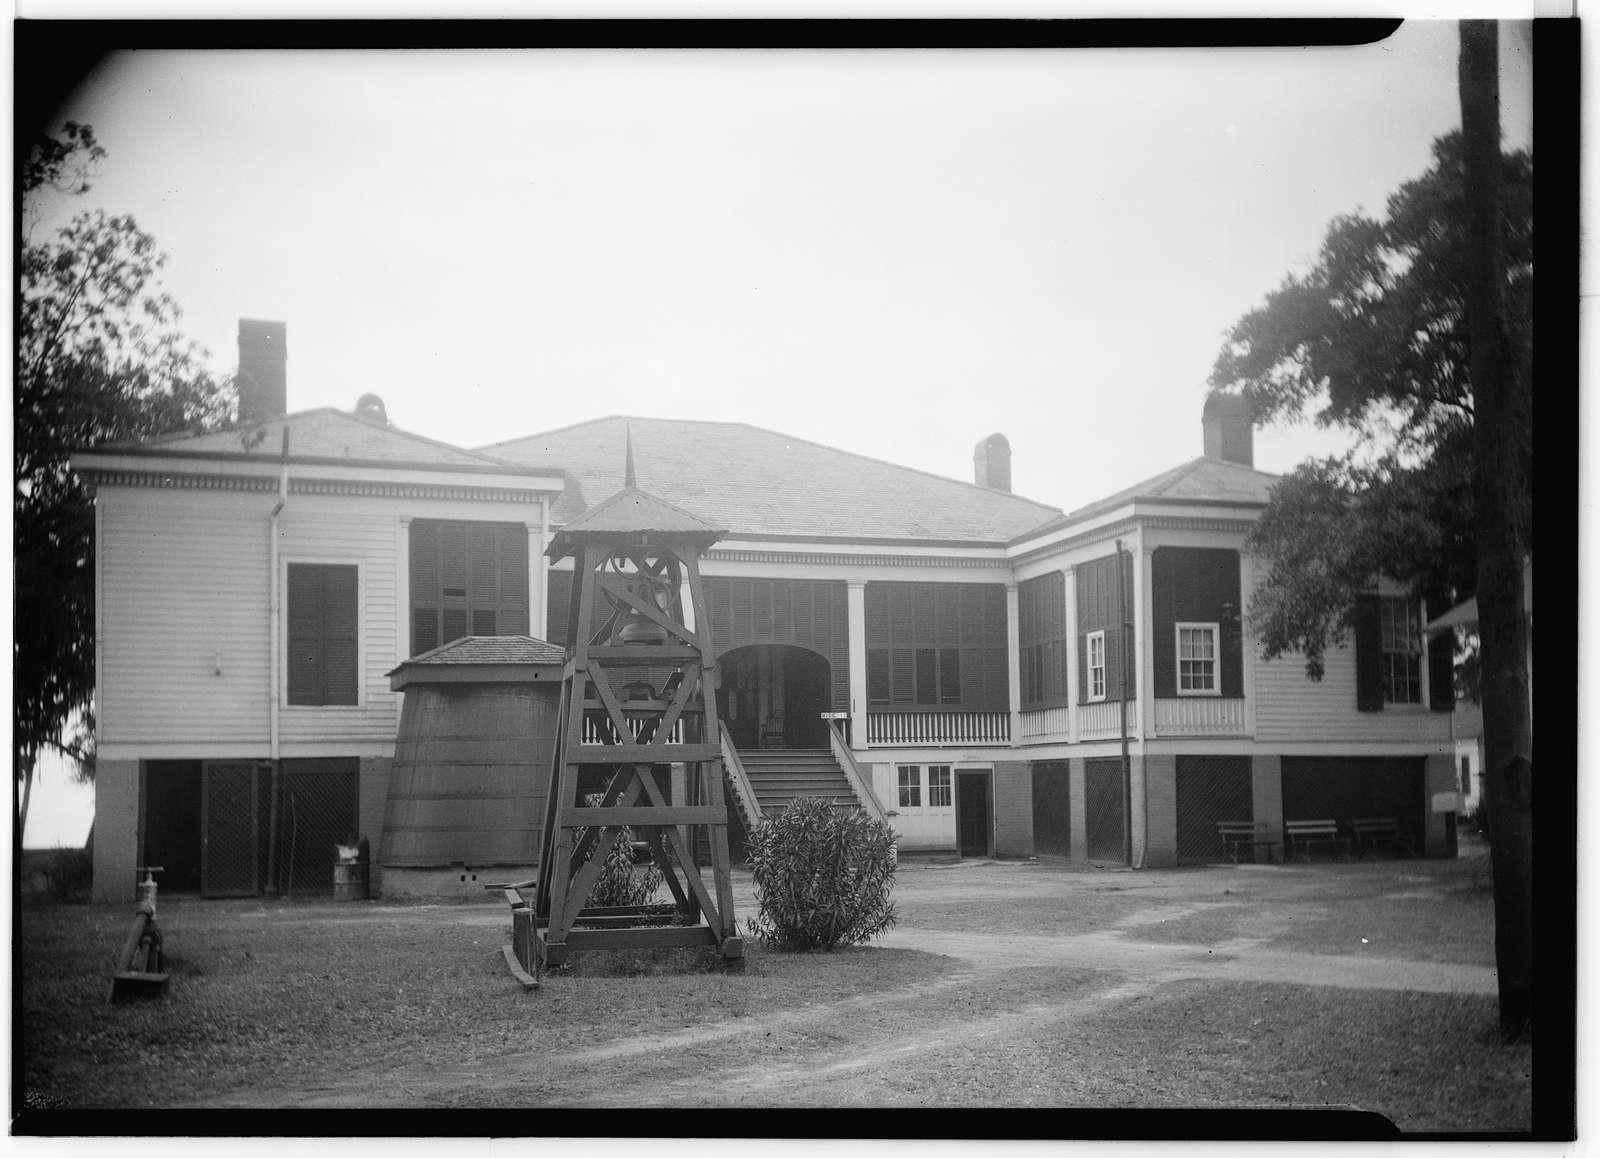 Beauvoir, 200 West Beach Road, Biloxi, Harrison County, MS